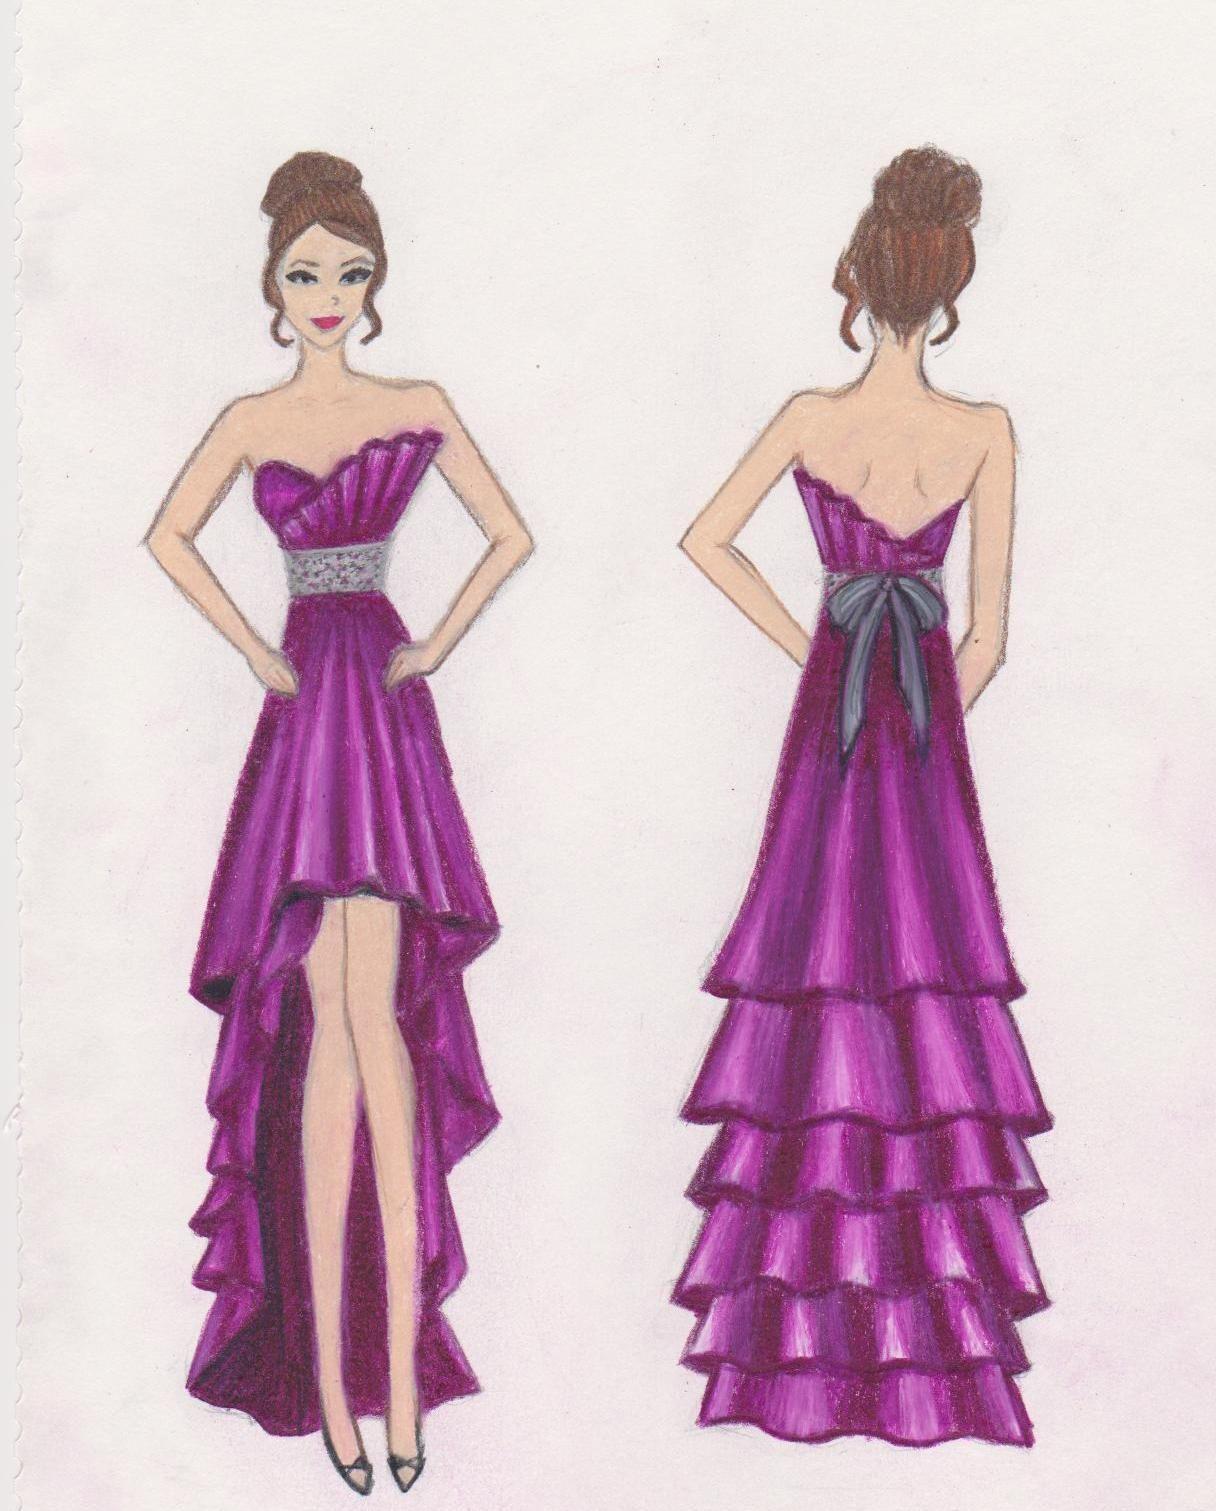 Prom Dress Design Contest Finalists! | David, Dress drawing and ...